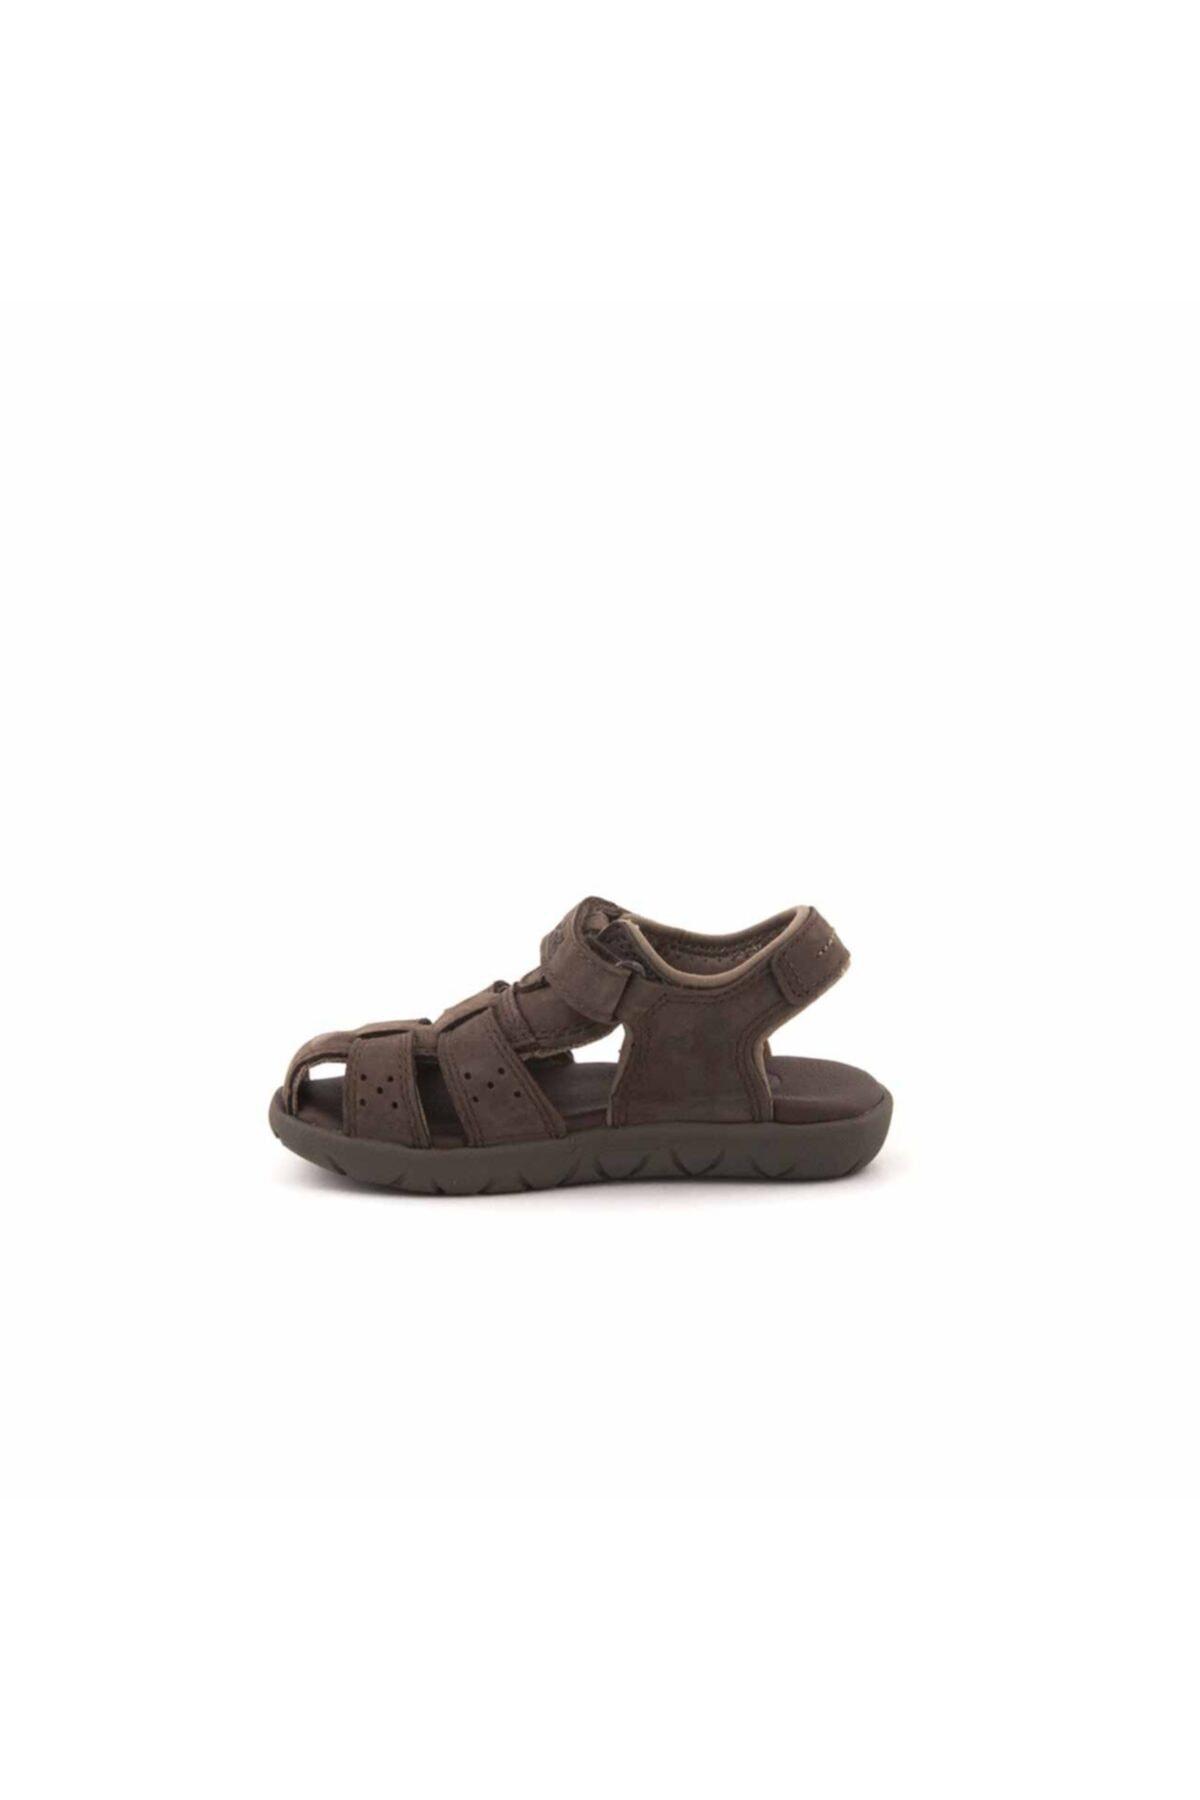 Timberland Erkek Çocuk Sandalet Tb0a24wed541 2